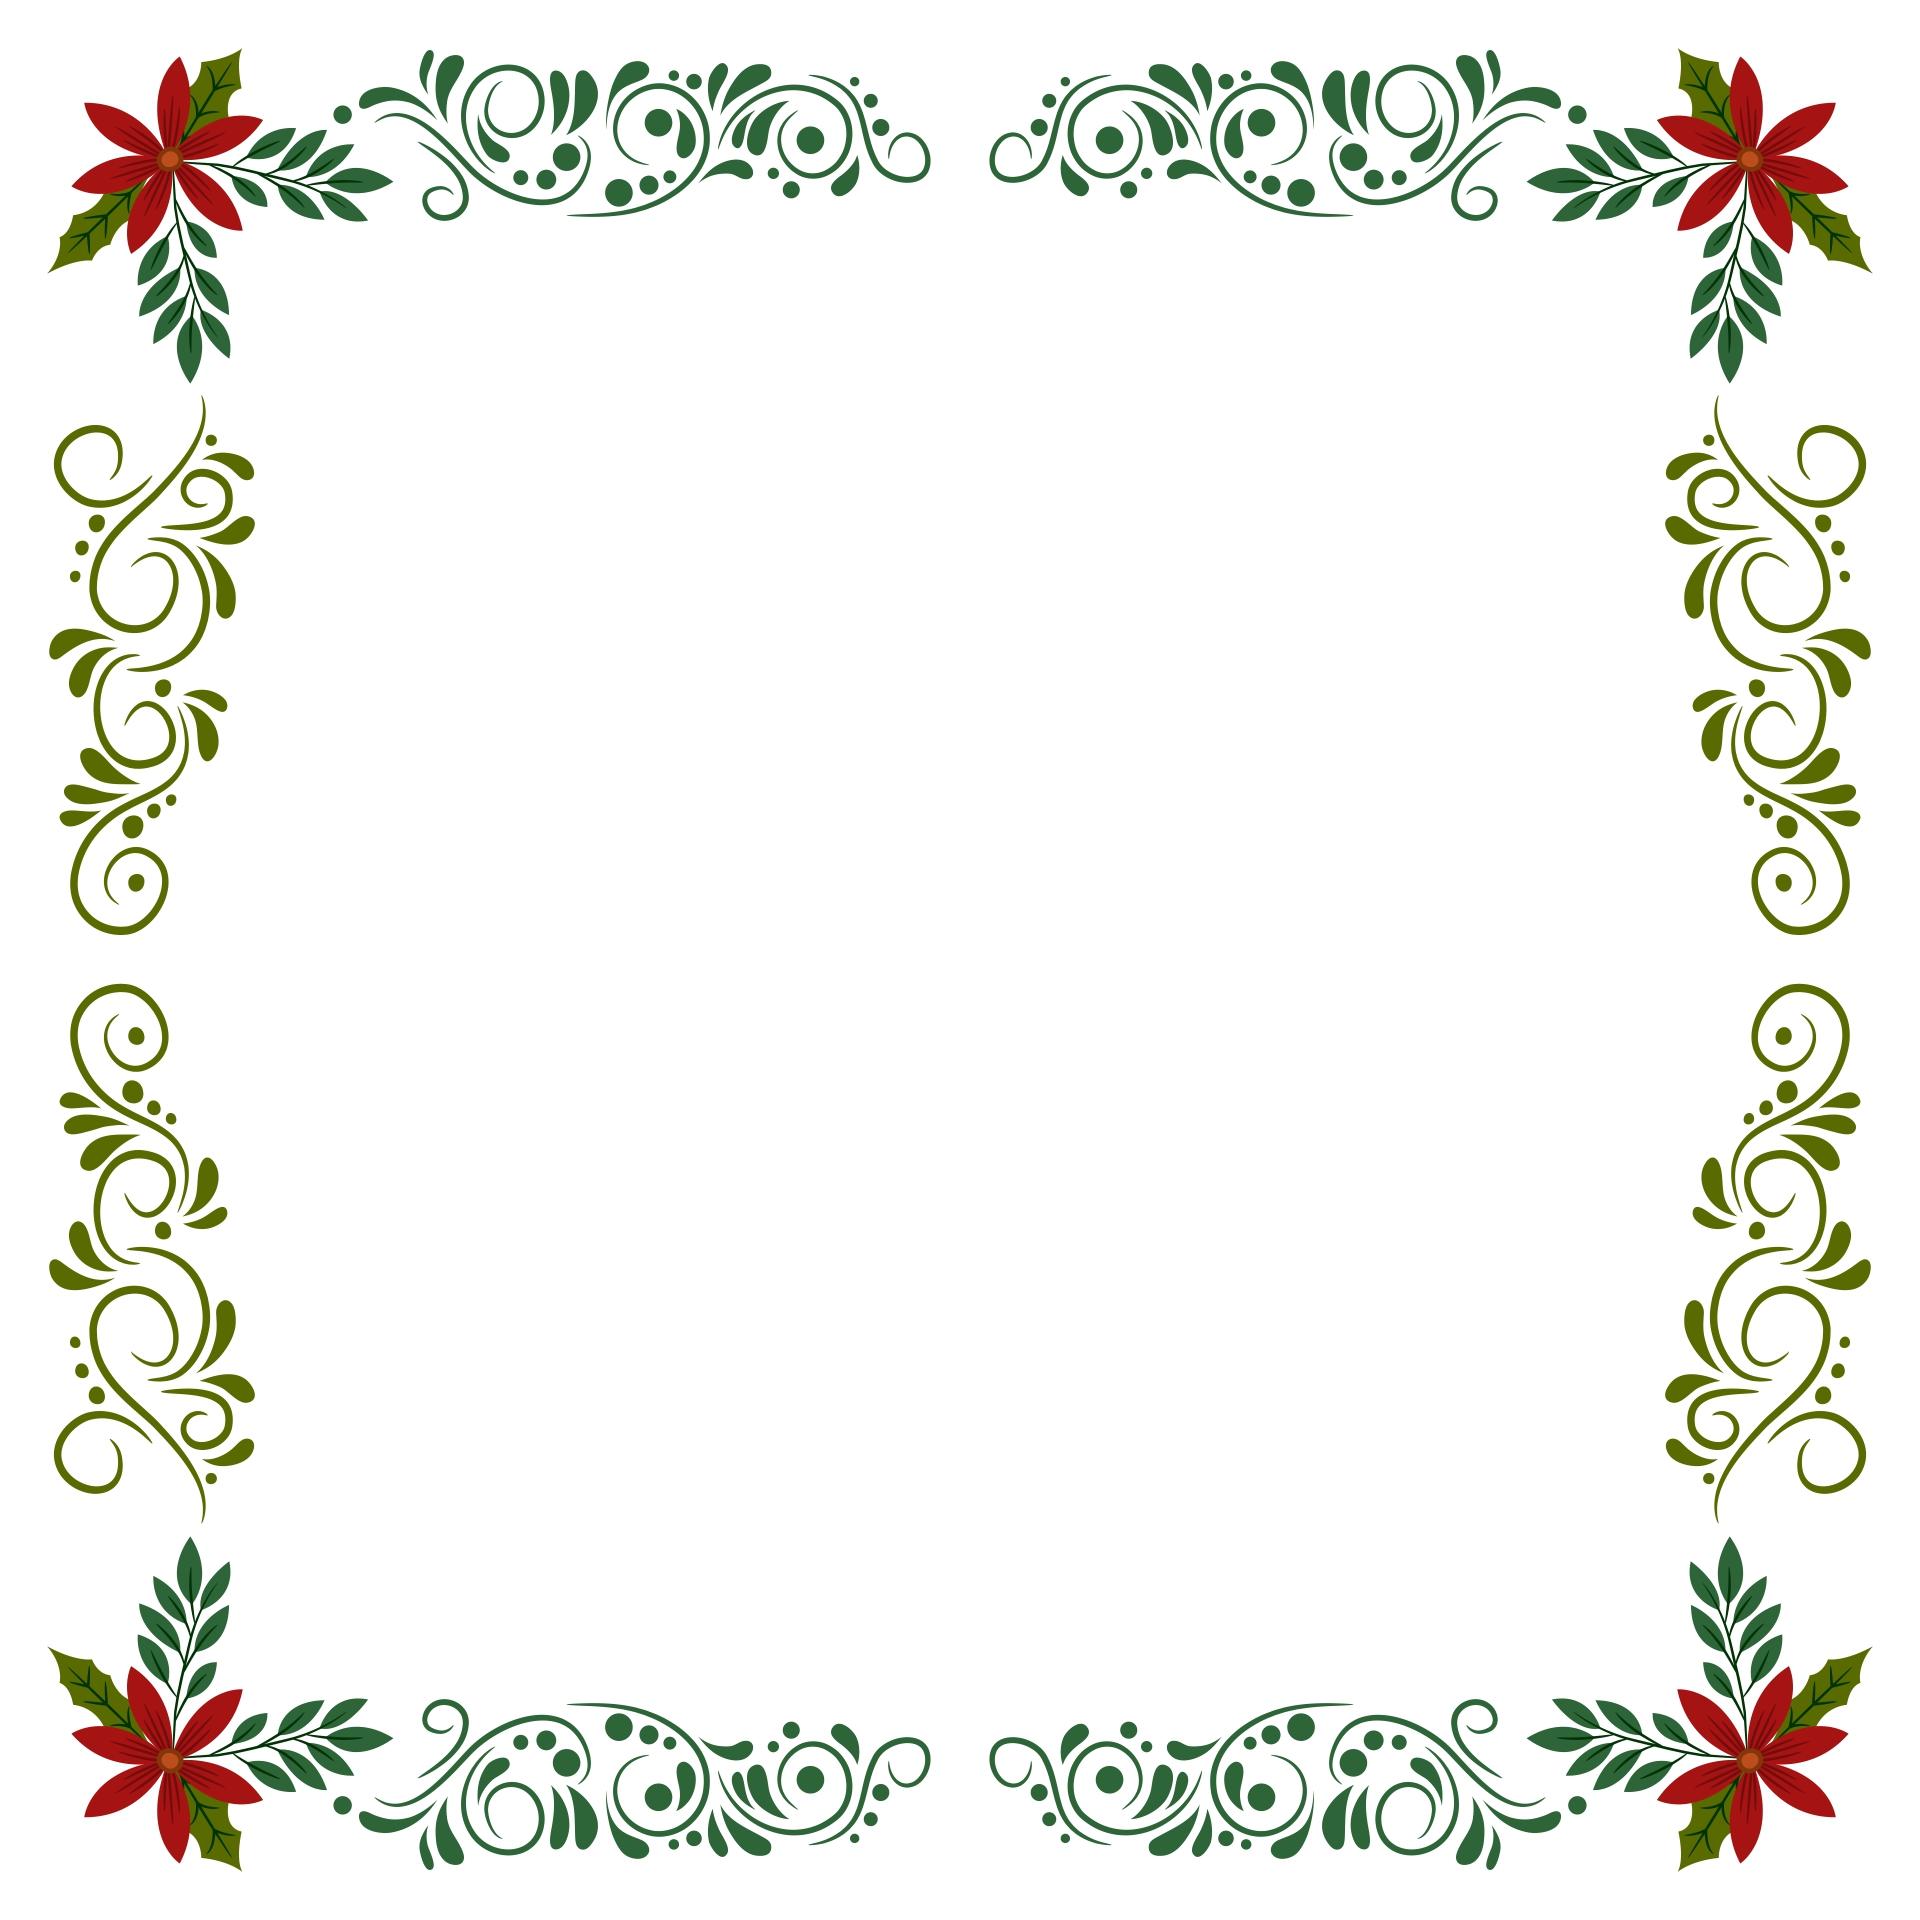 Christmas Holly Border Free Clip Art